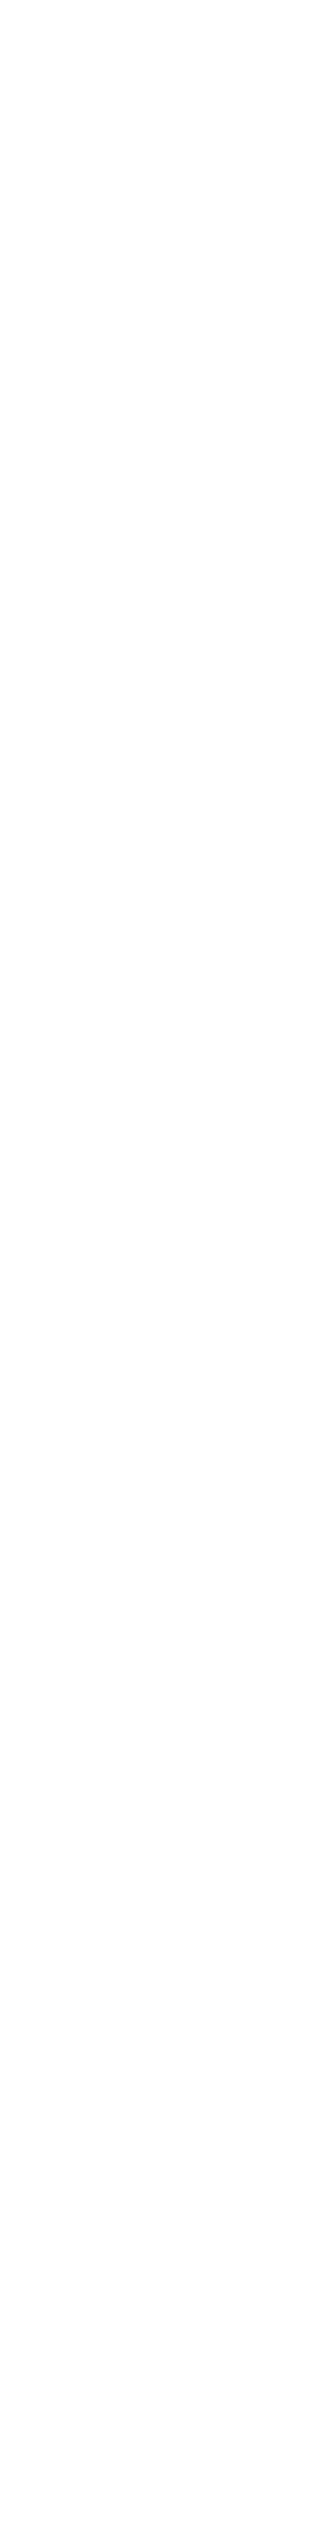 Collum Icon